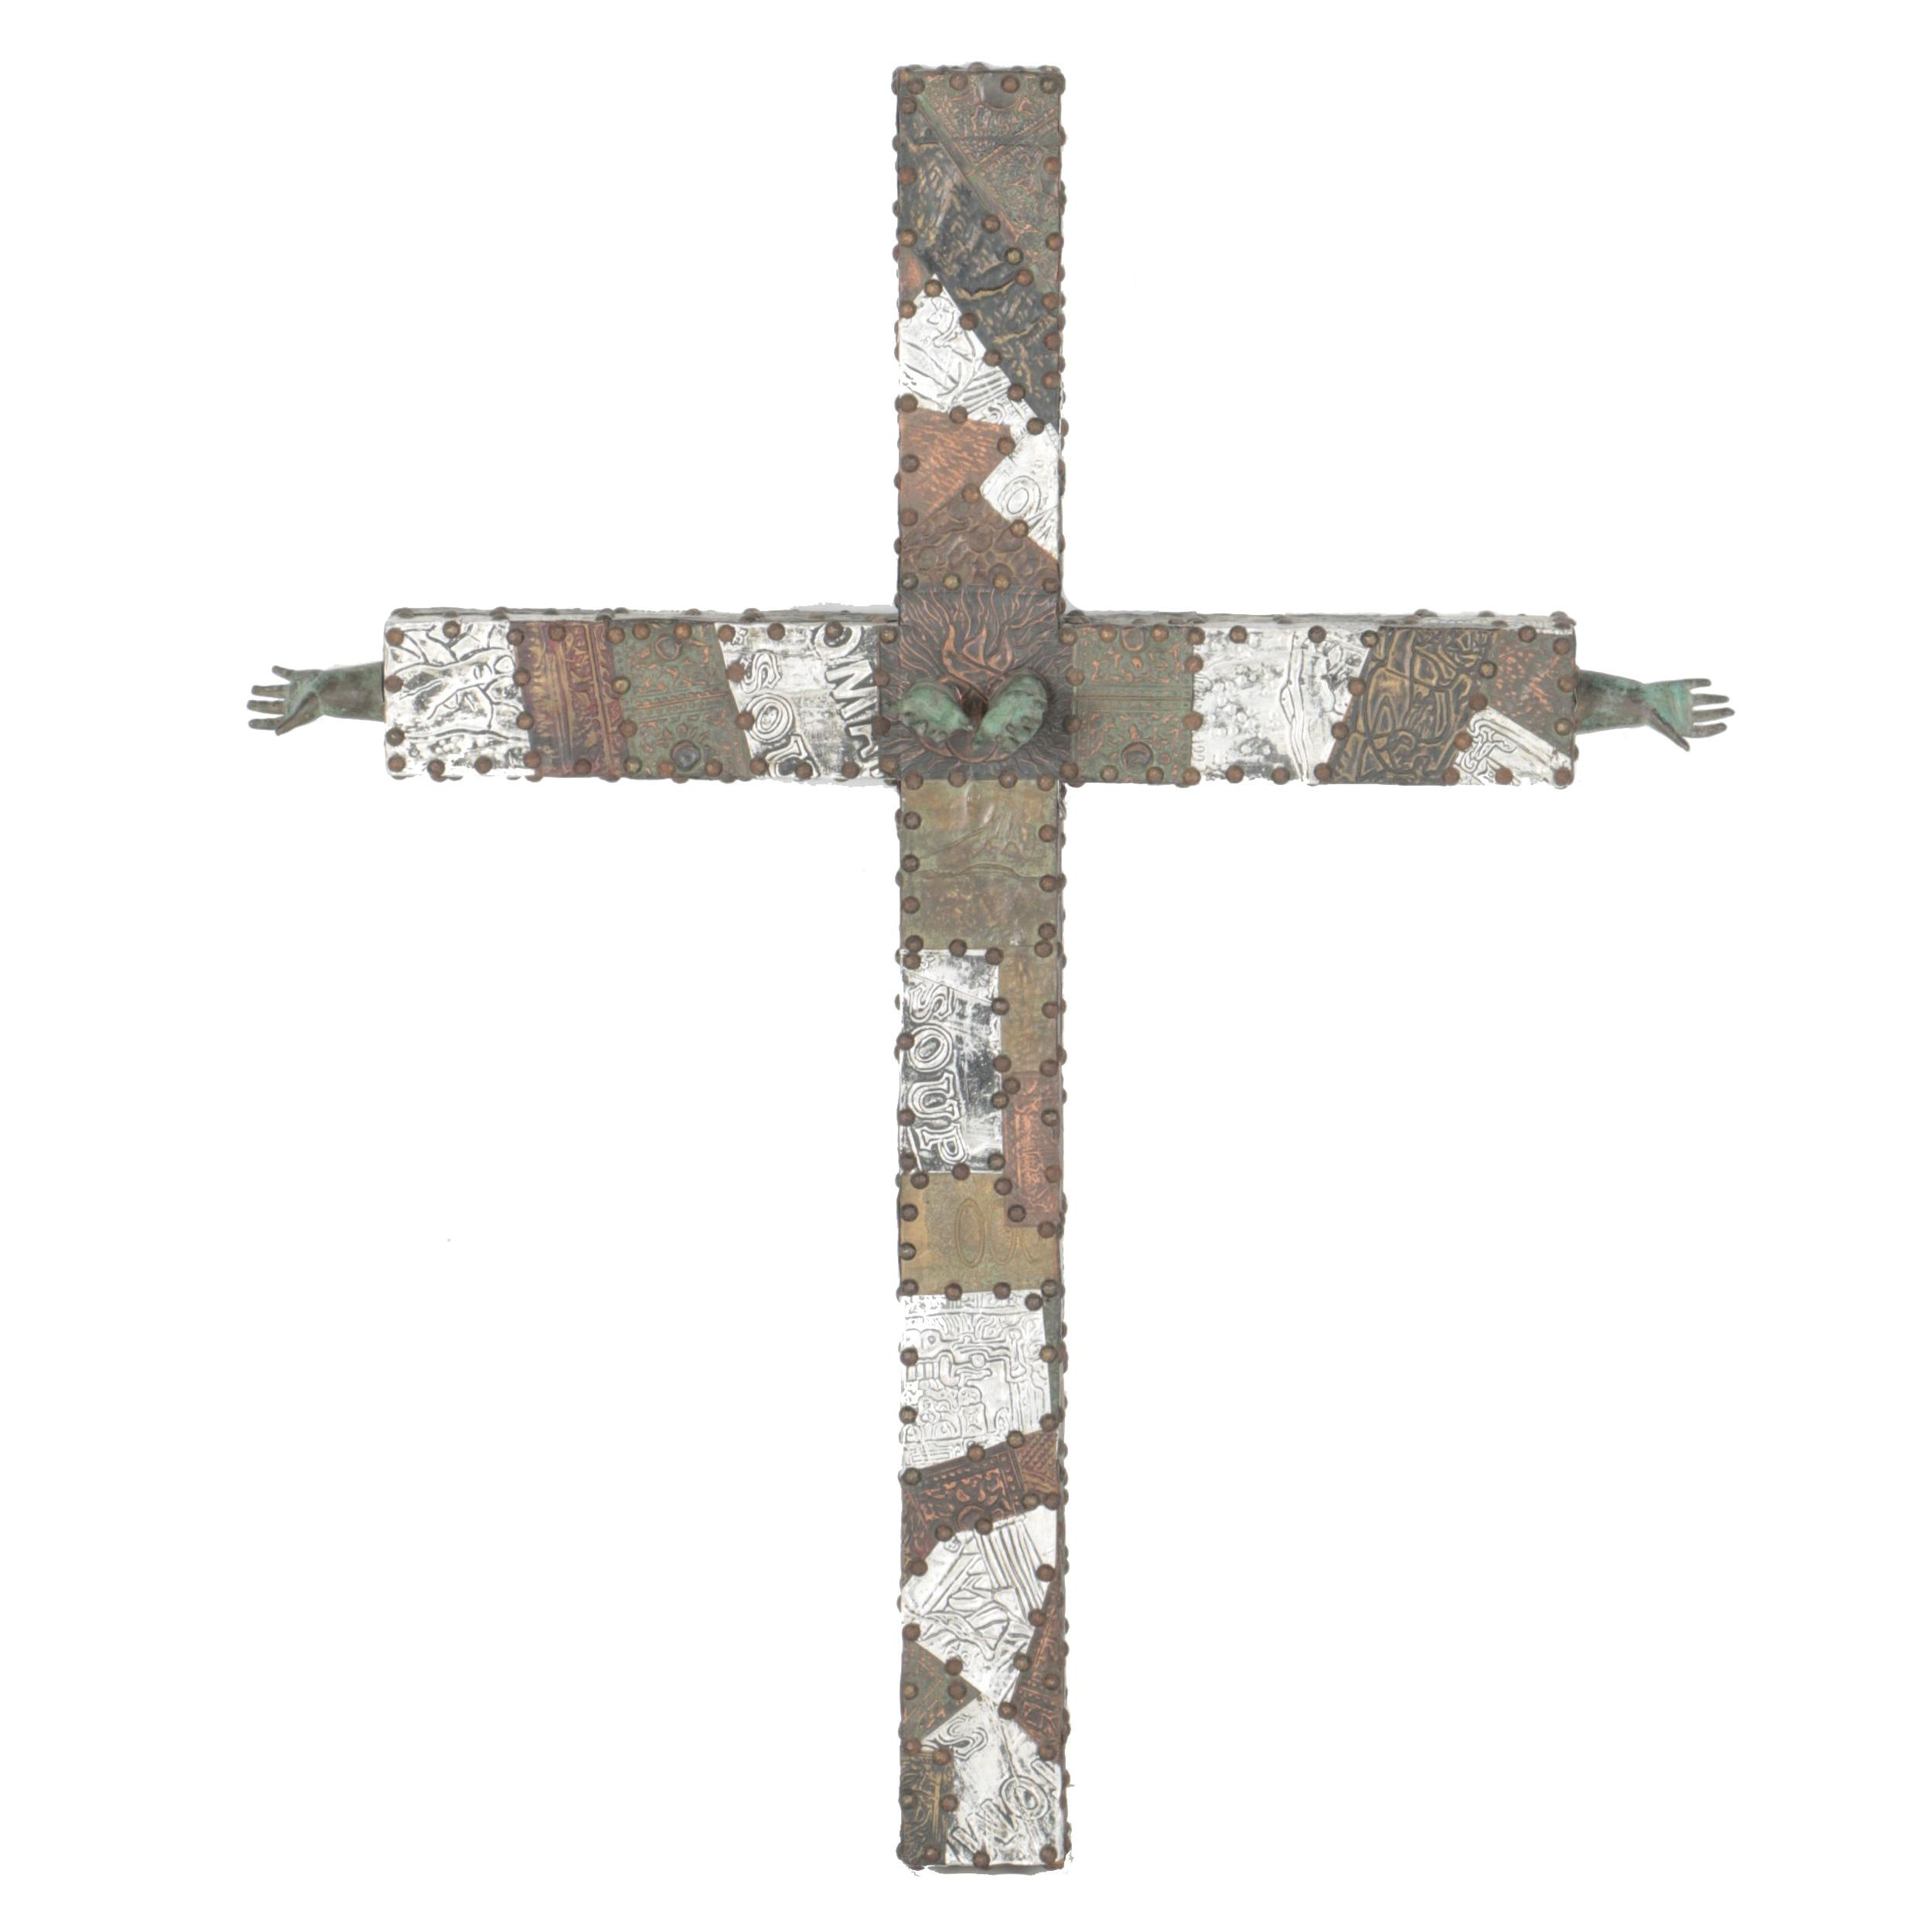 Wood and Metal Cross Sculpture